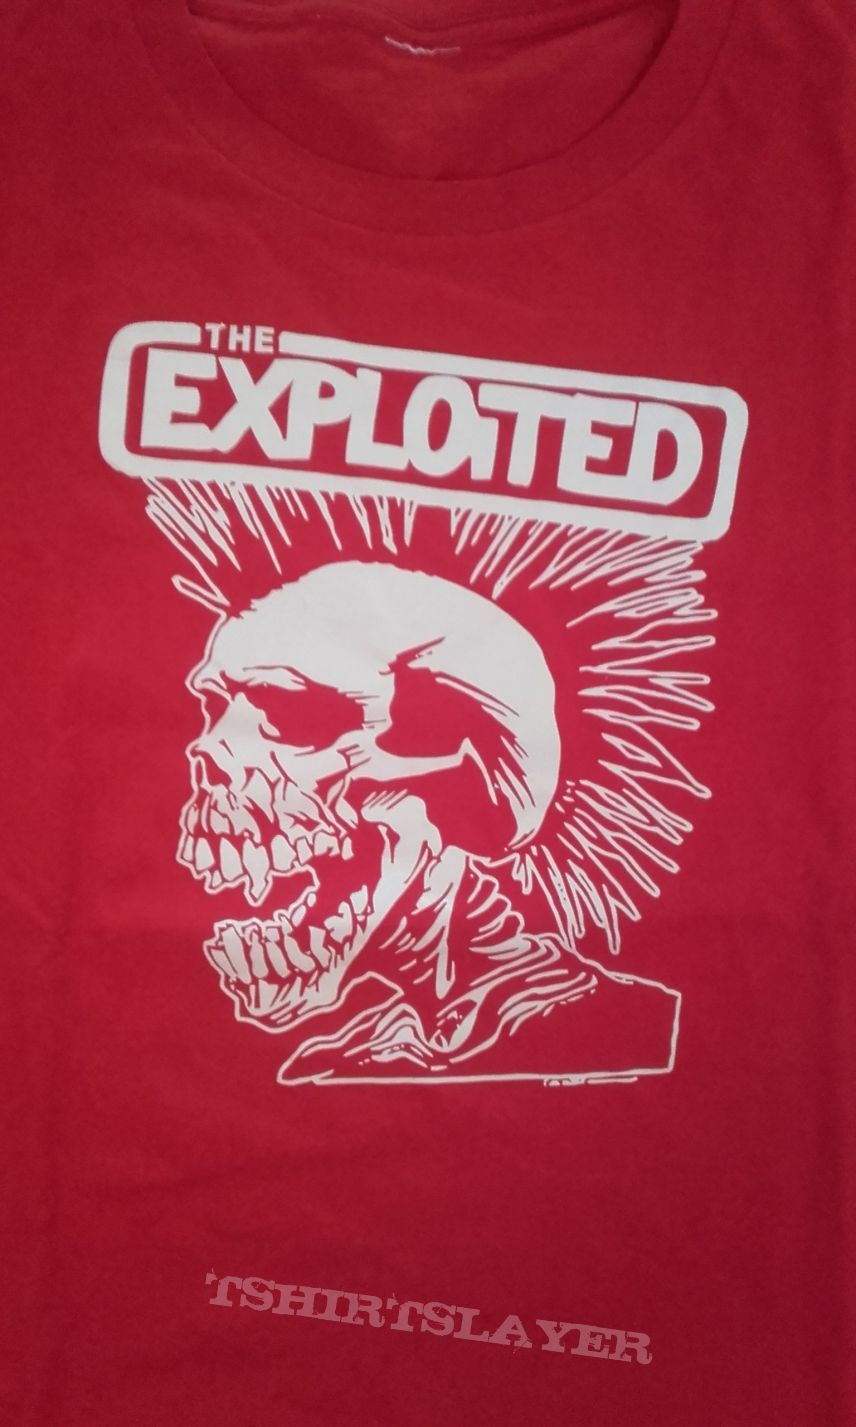 The Exploited tshirt